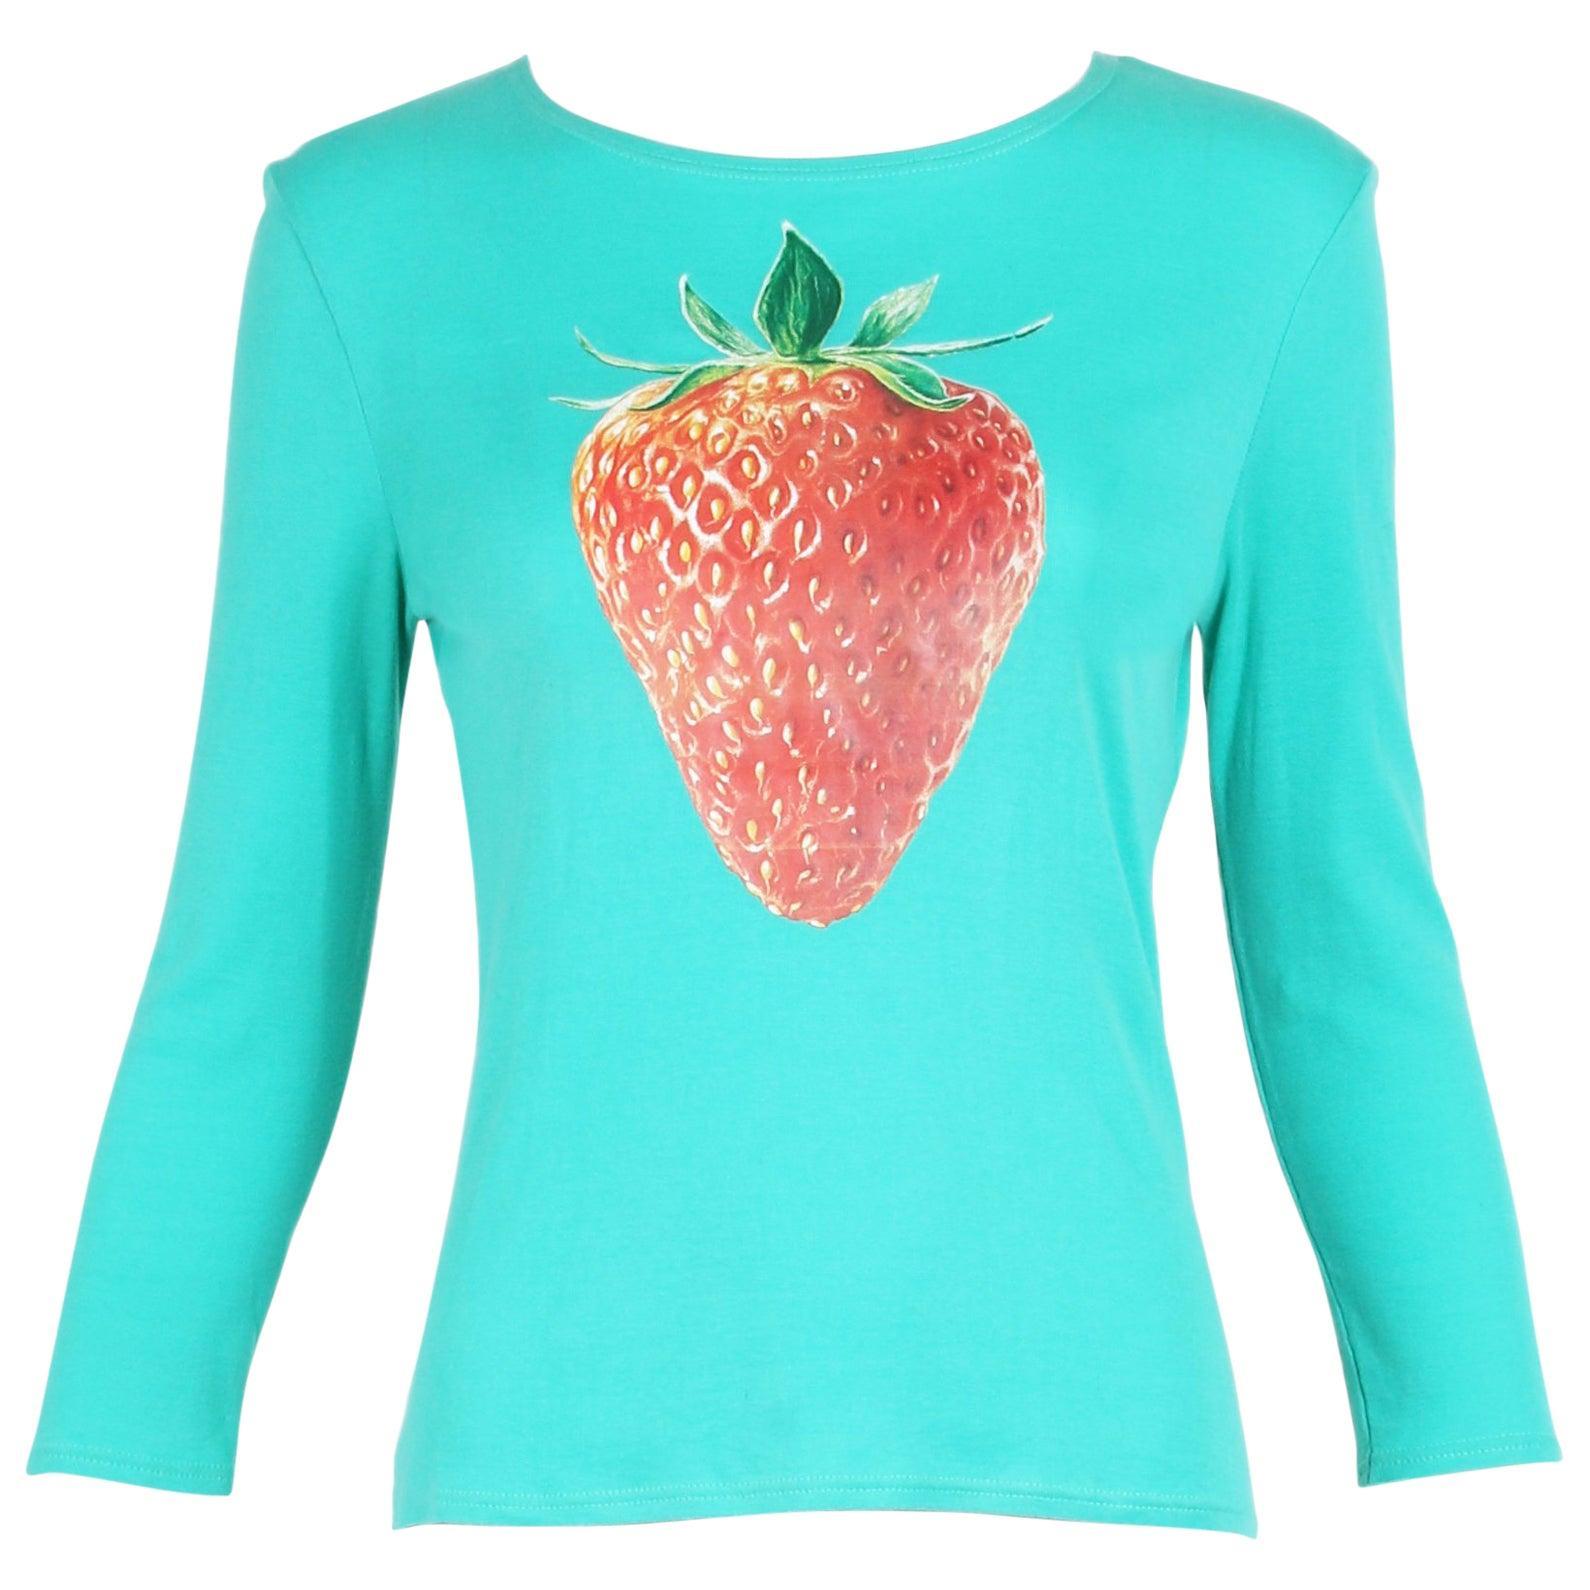 Chloe by Stella McCartney Cotton Long Sleeved T-Shirt w/Strawberry ...